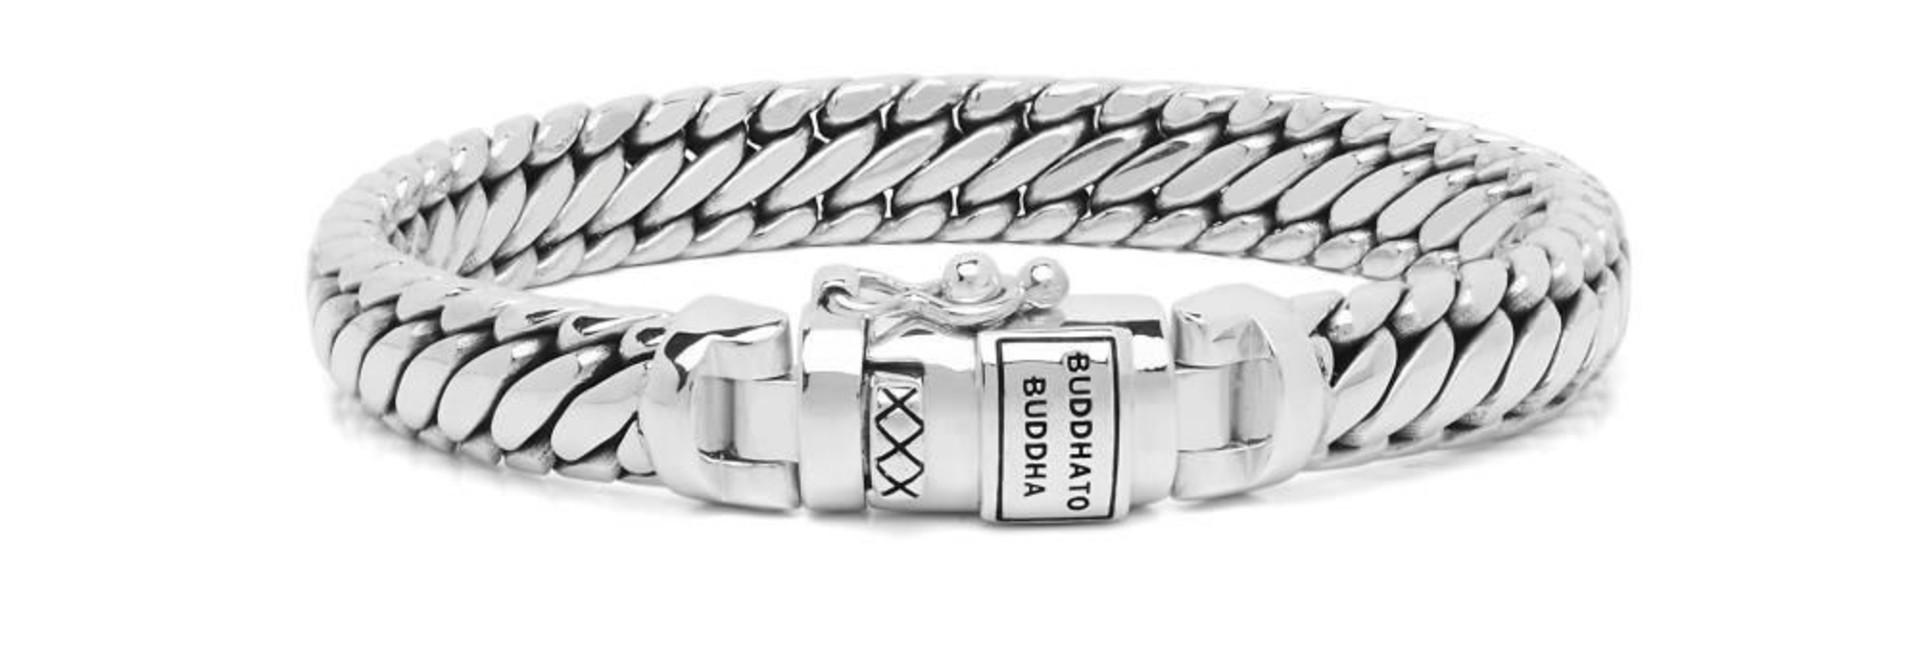 Ben XS Bracelet